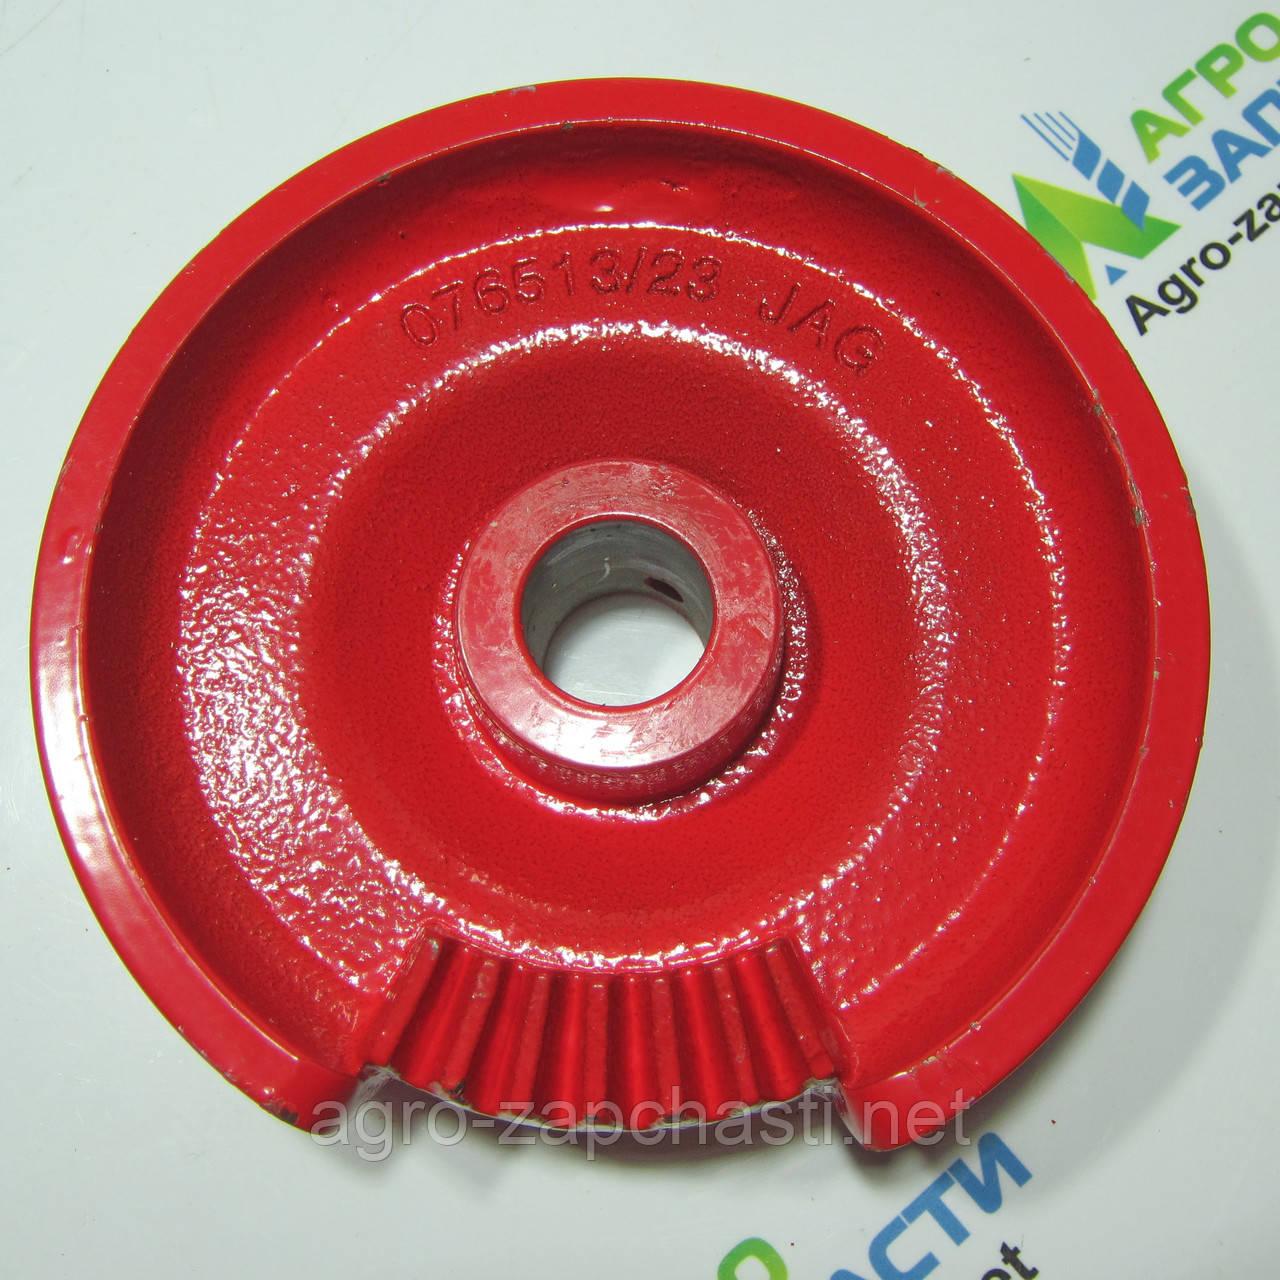 Тарелка (диск) вязального аппарата пресс-подборщика Welger AP 42,48,52, d30мм